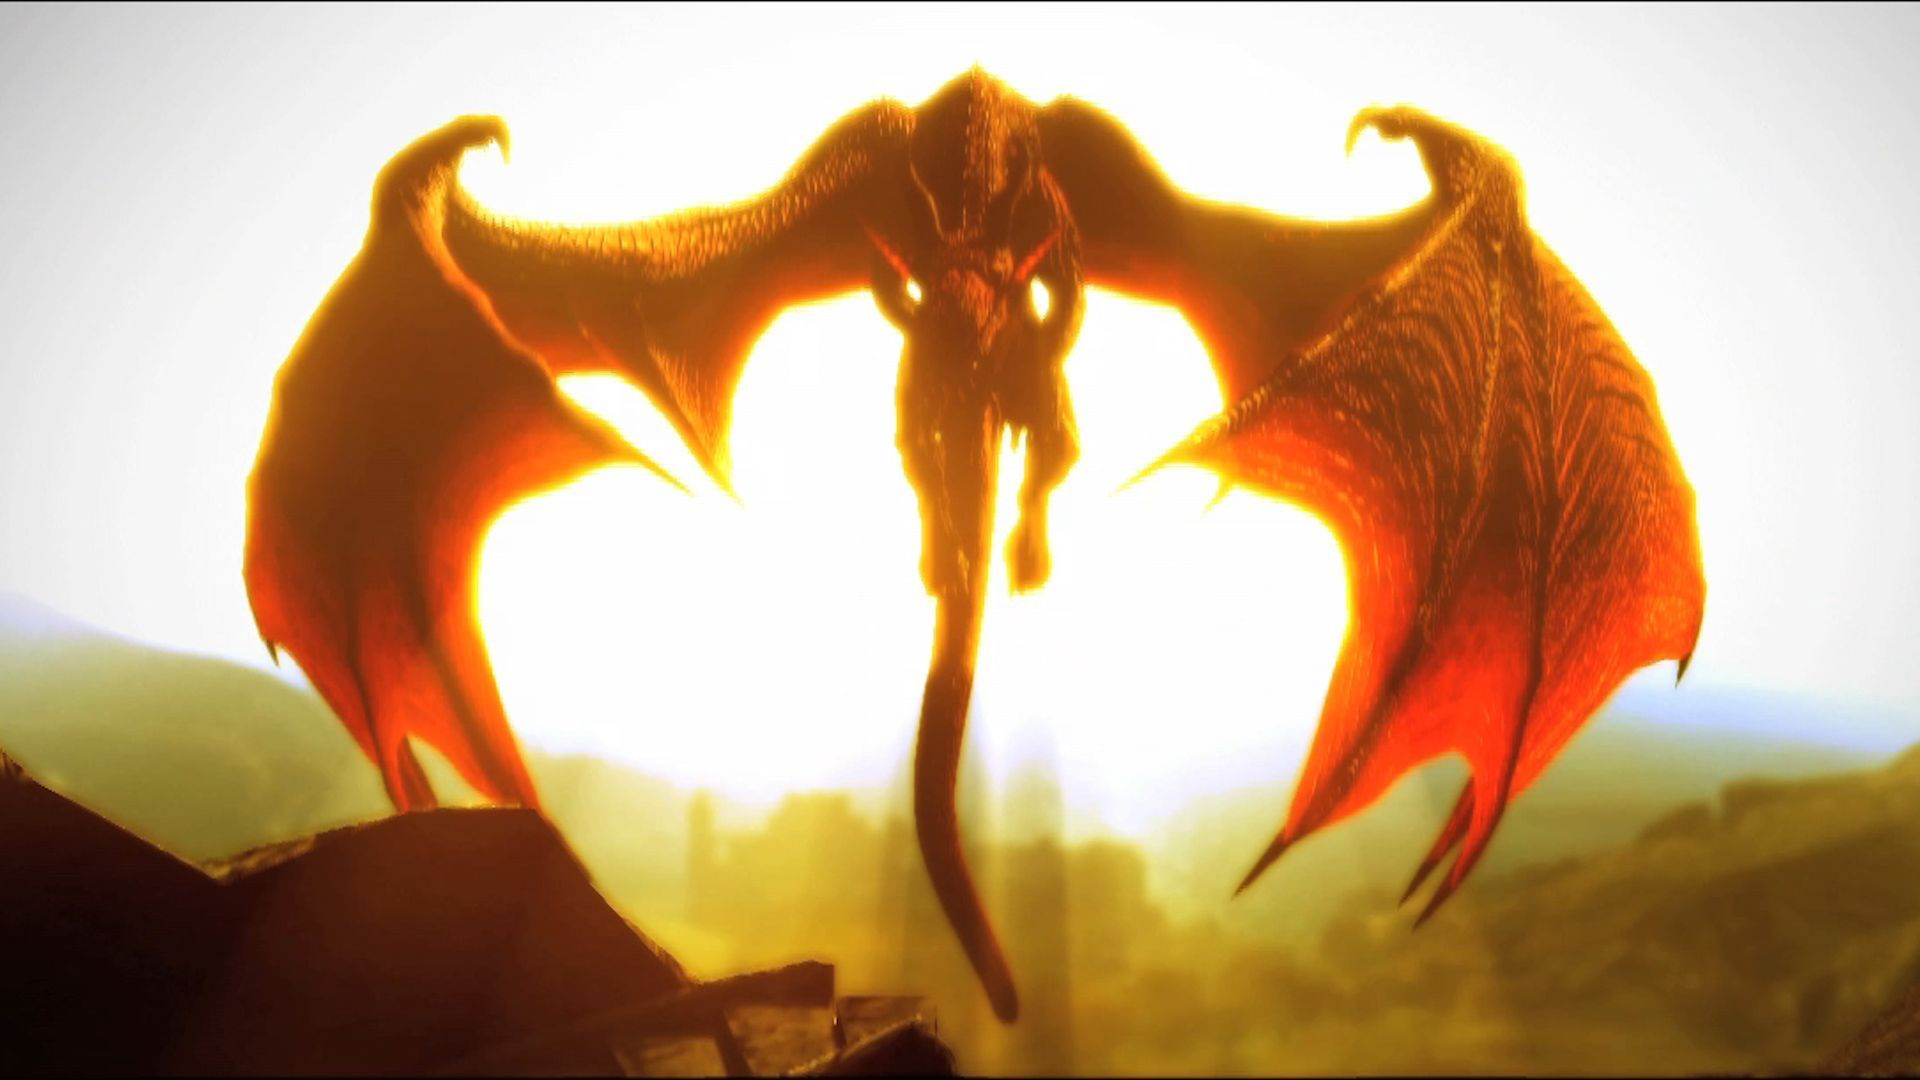 Dragon S Dogma Wallpapers Top Free Dragon S Dogma Backgrounds